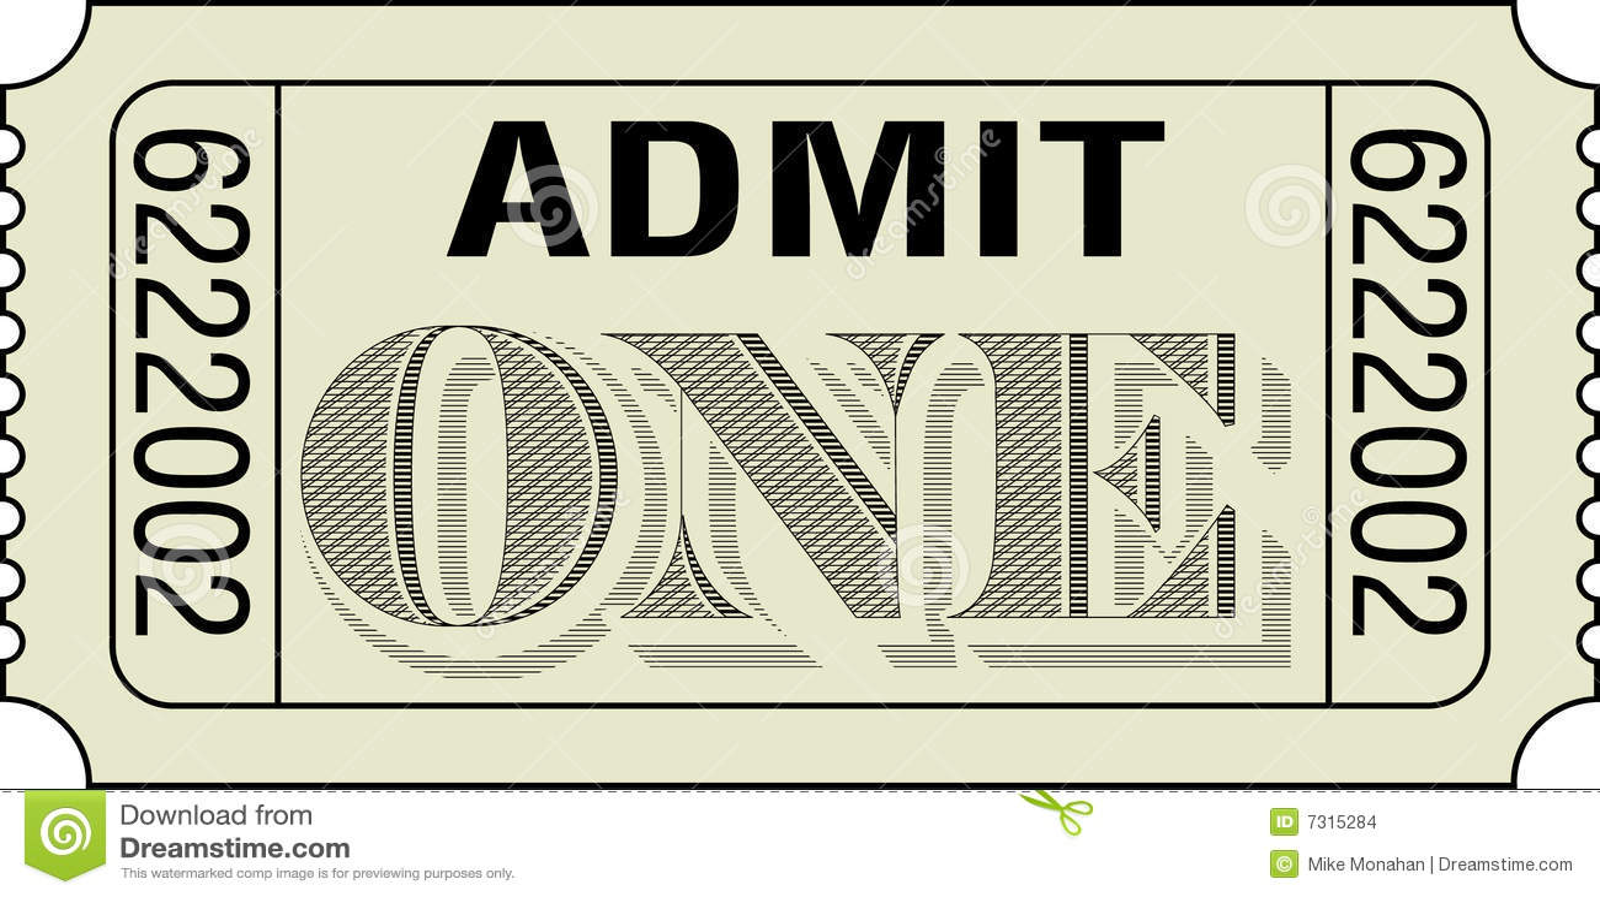 admit one ticket stock images image 7315284. Black Bedroom Furniture Sets. Home Design Ideas